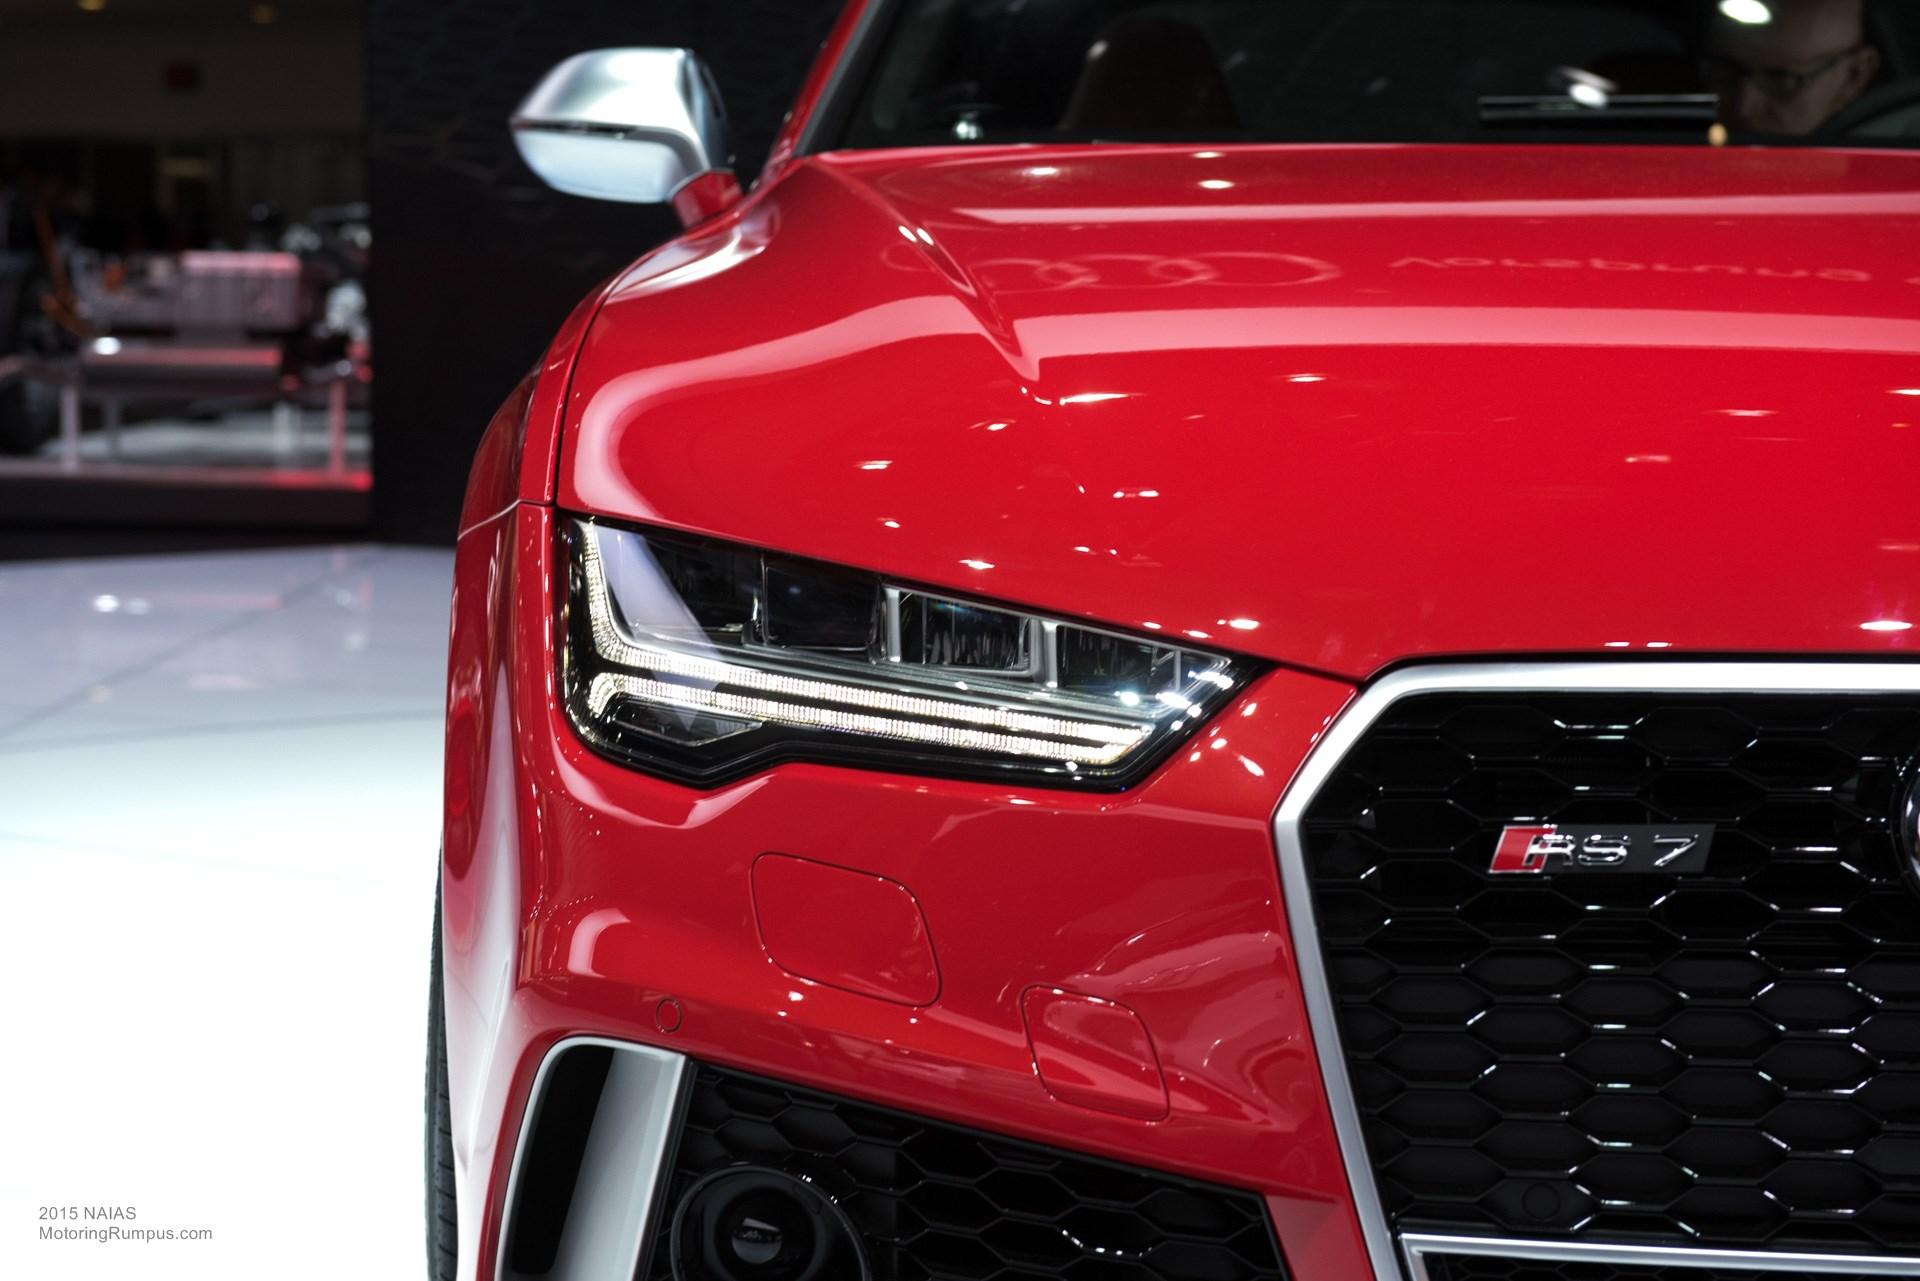 2015 NAIAS Audi RS7 Headlight